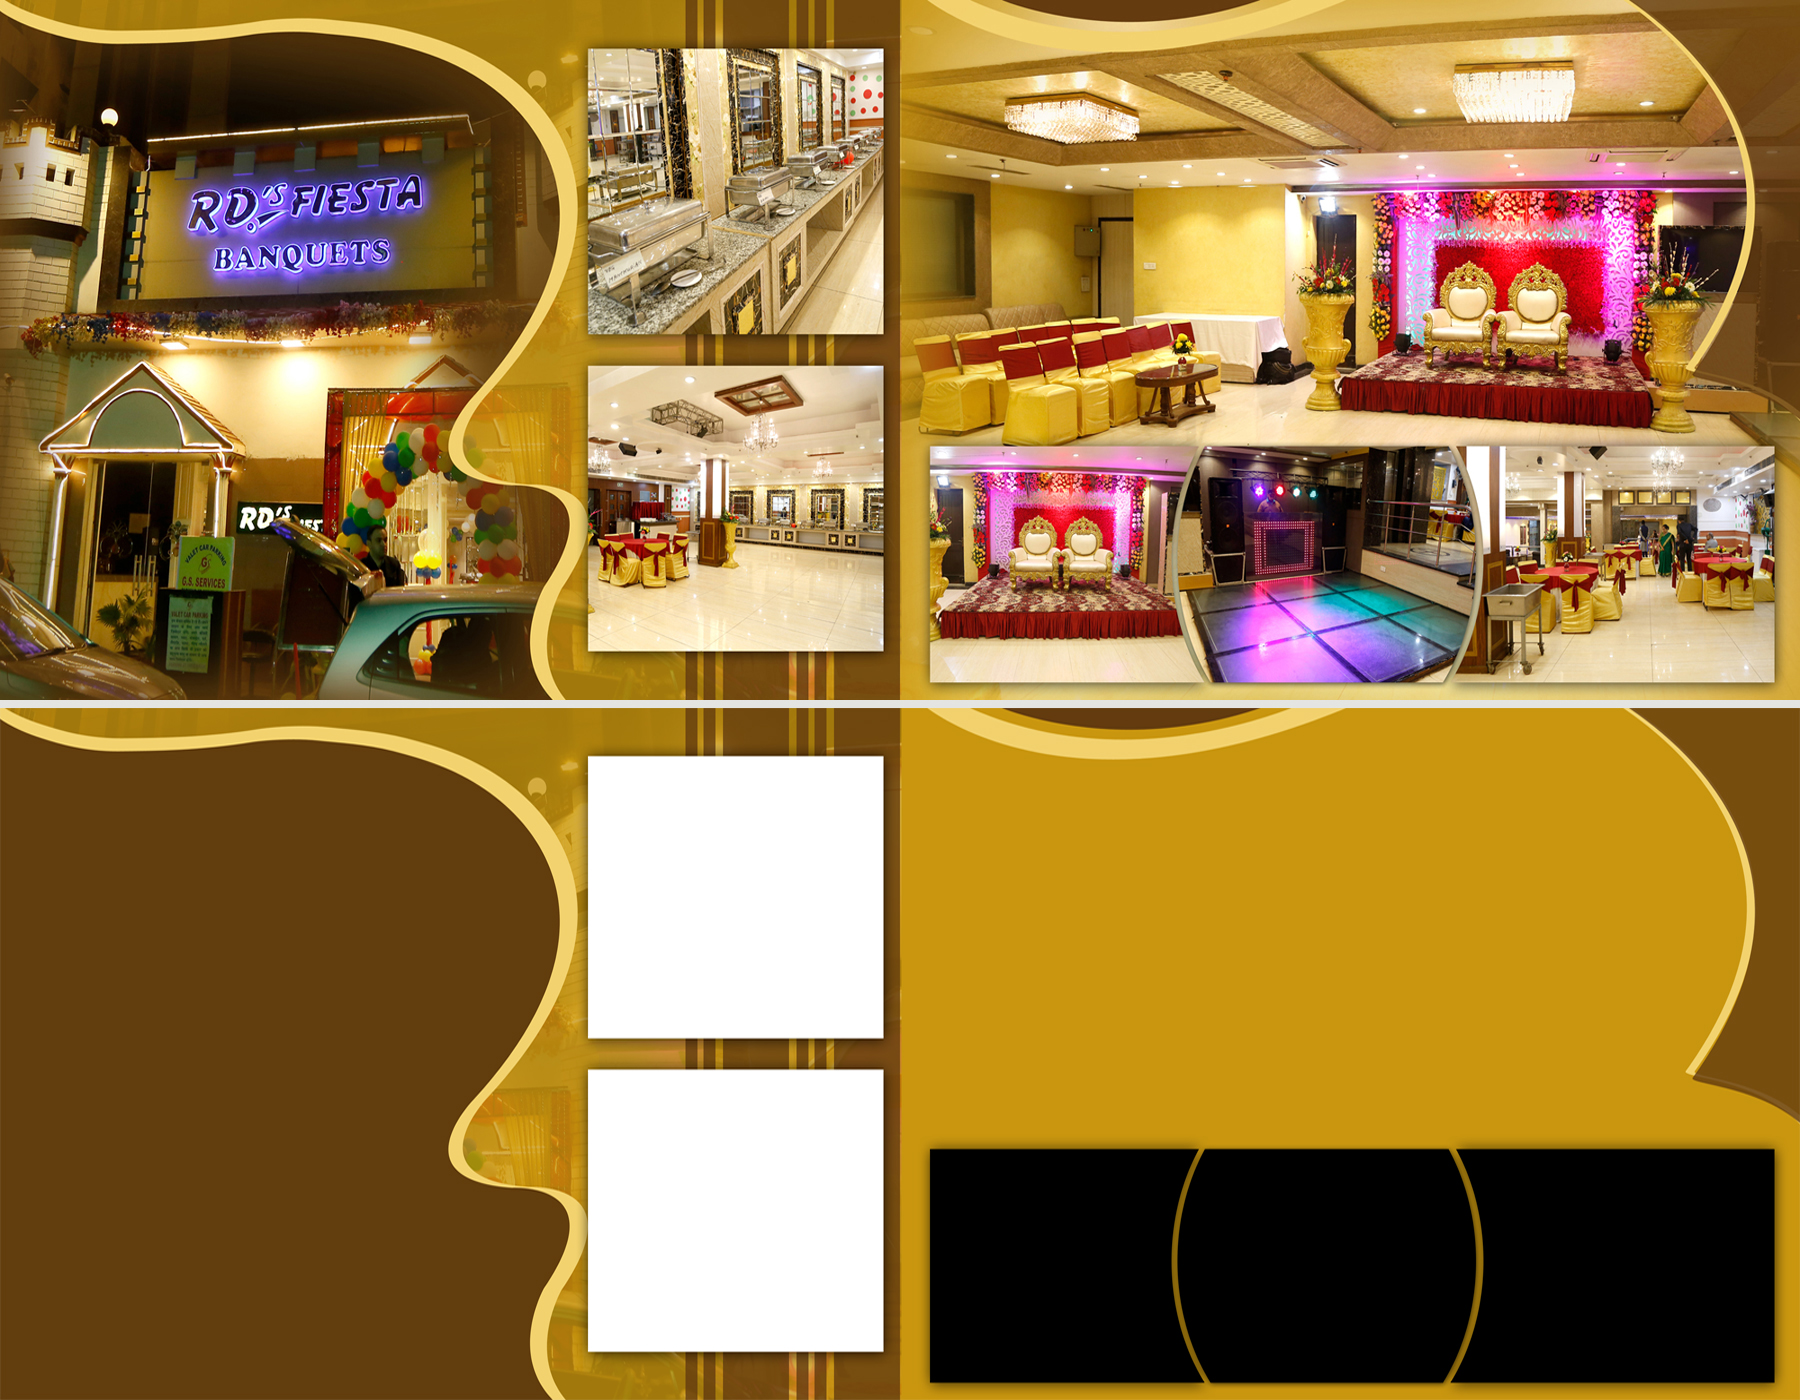 Wedding Album Background Images Free Download 50010 Lavanya Fabric Design